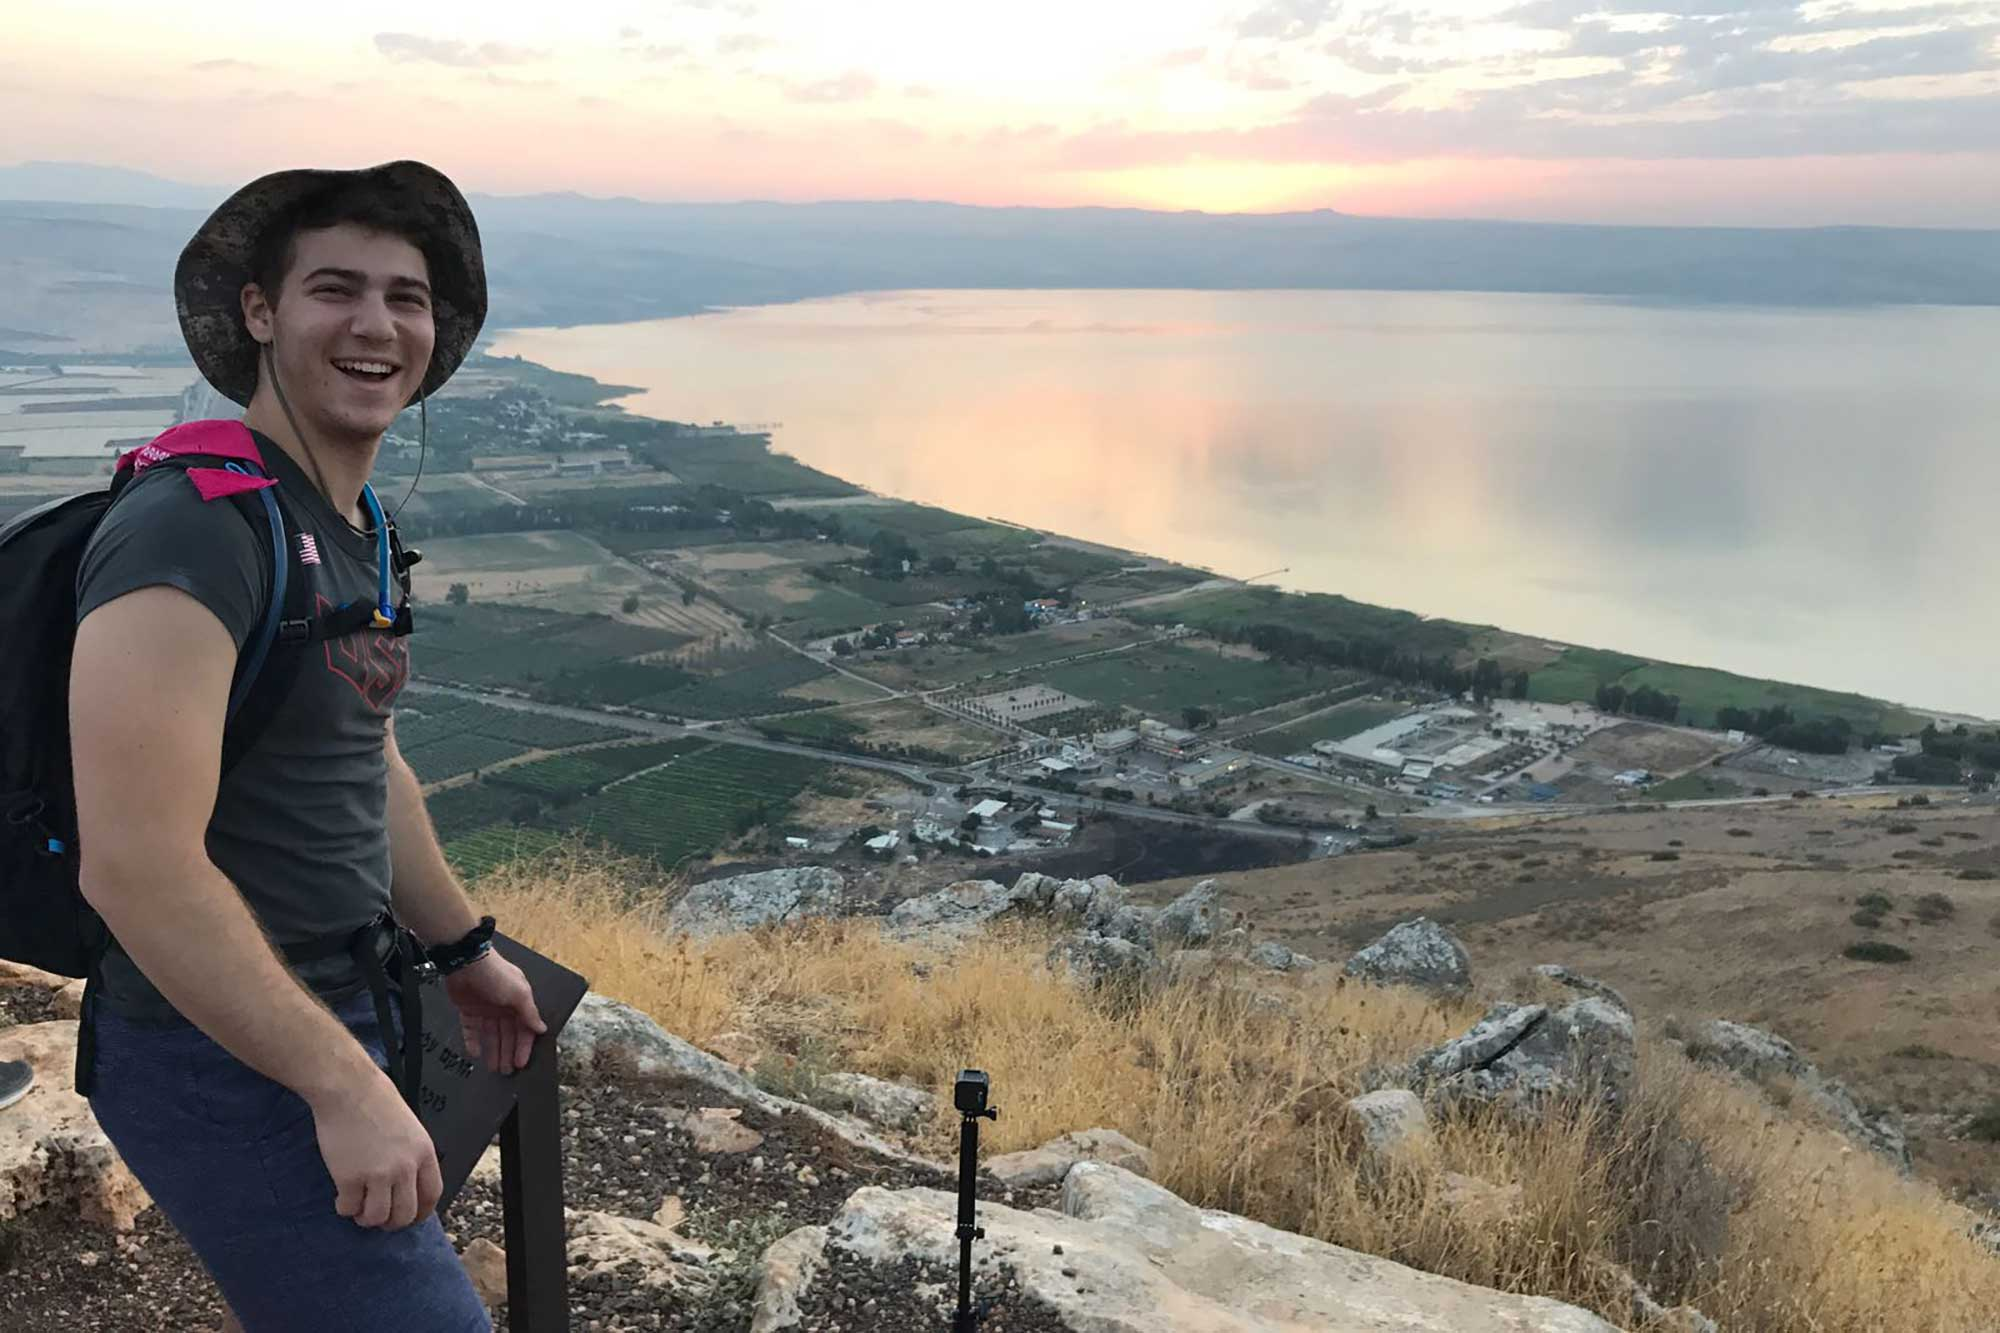 USY Israel Adventure